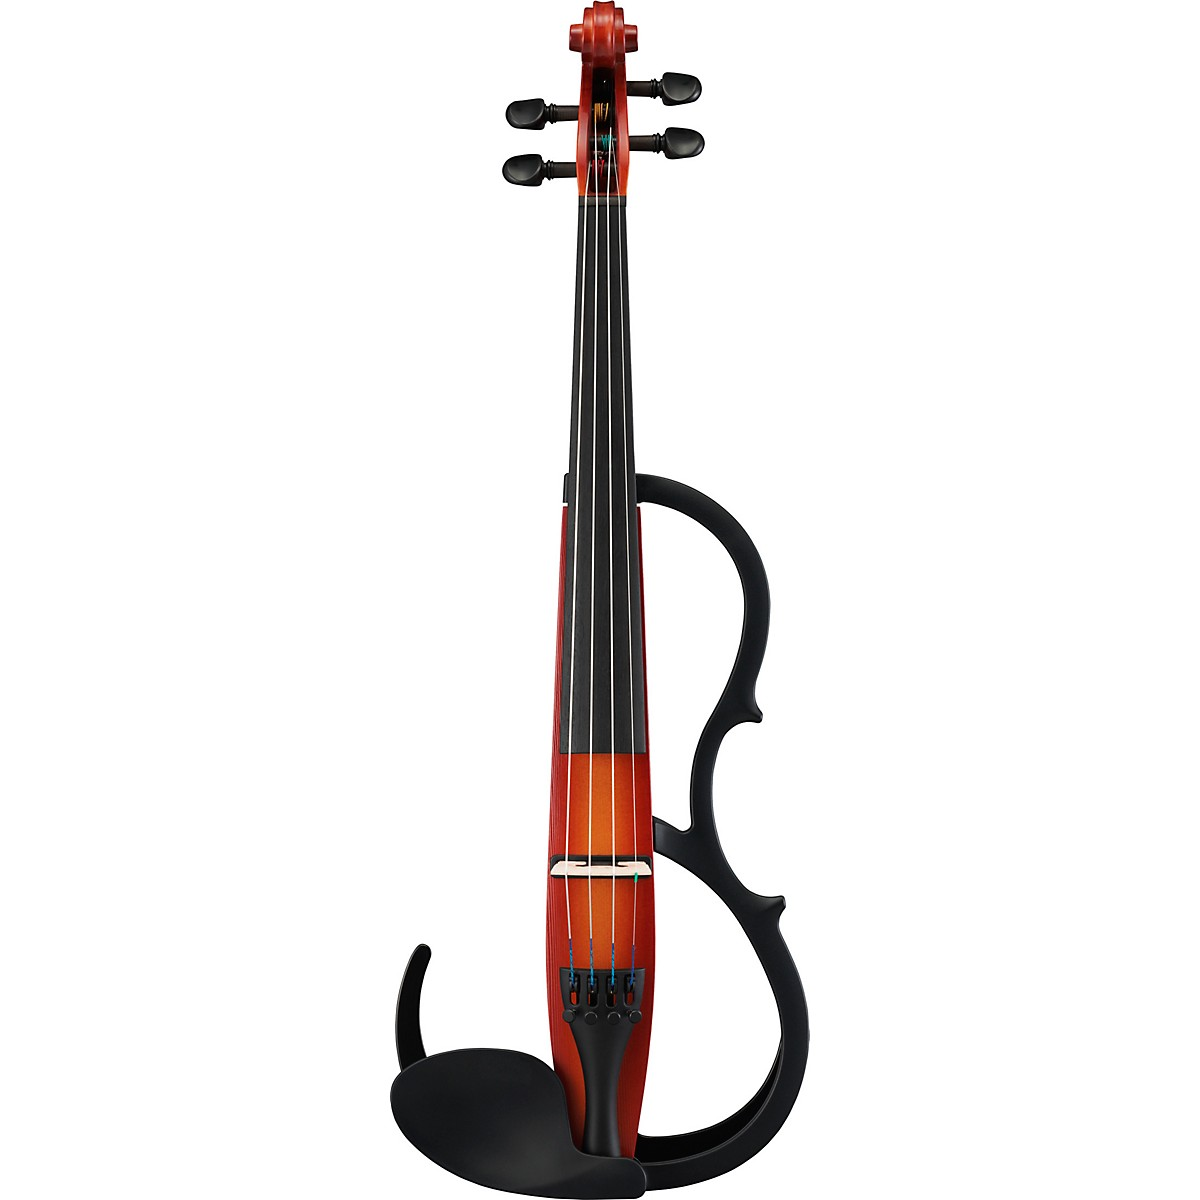 Yamaha SV-250 Electric Violin